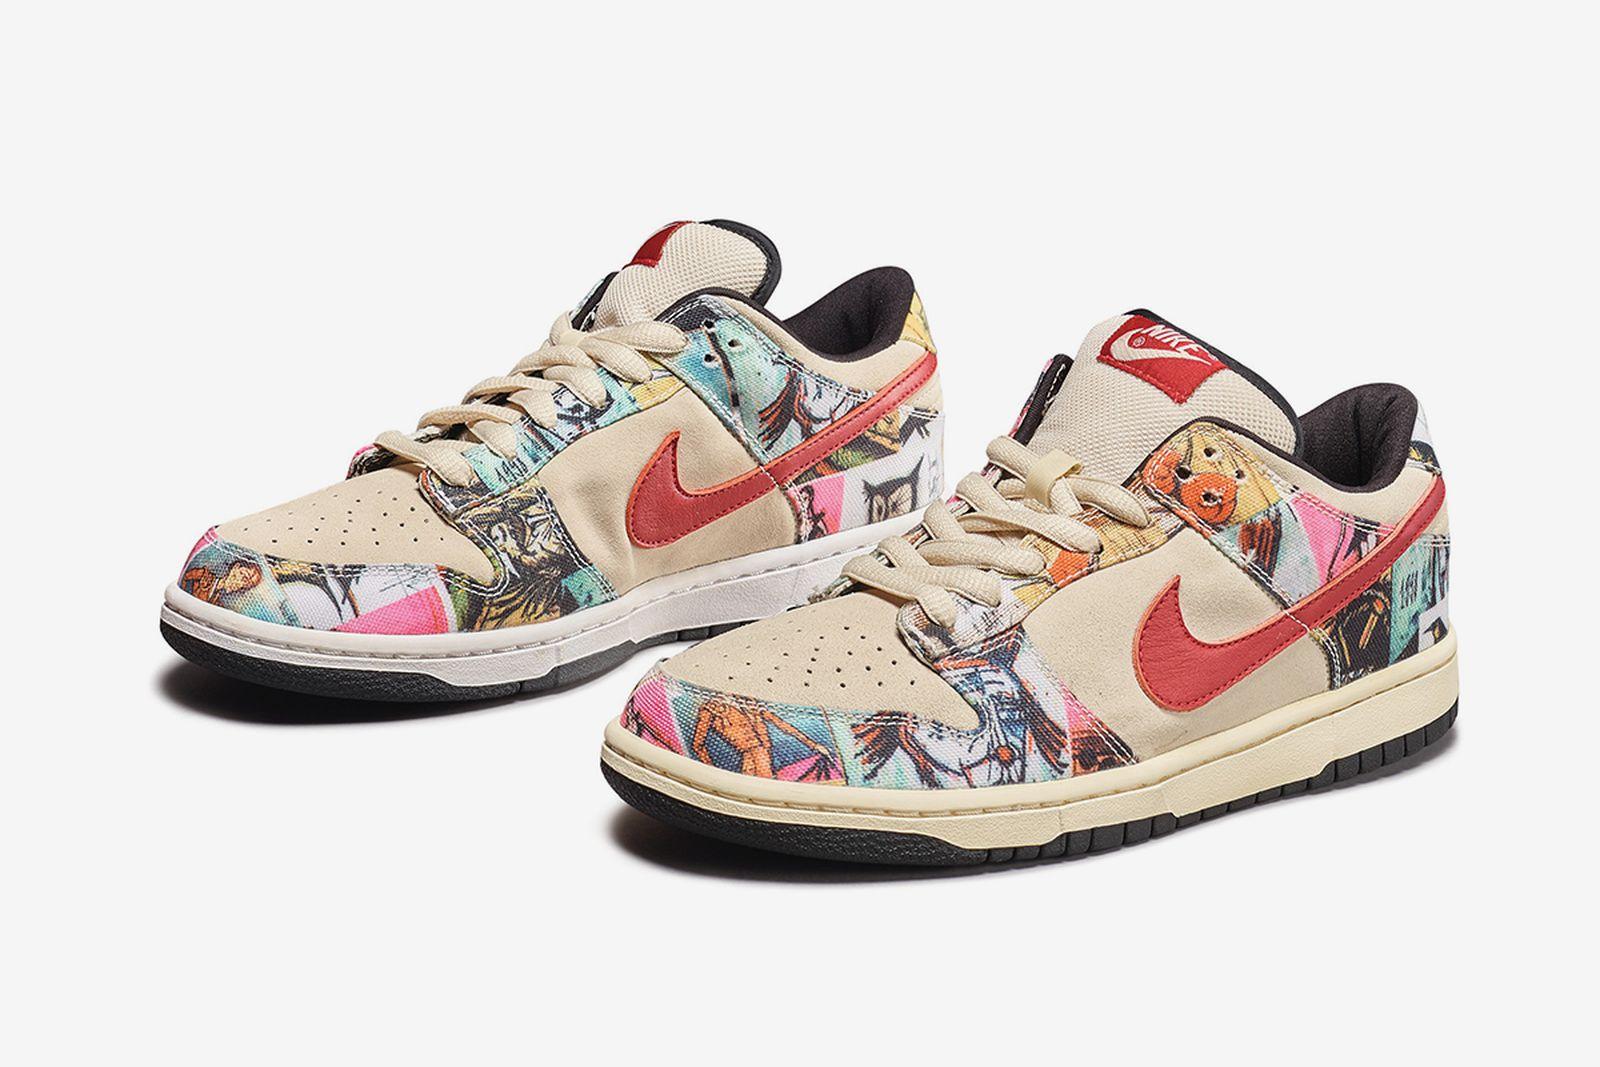 sothebys-nike-sneaker-auction-01